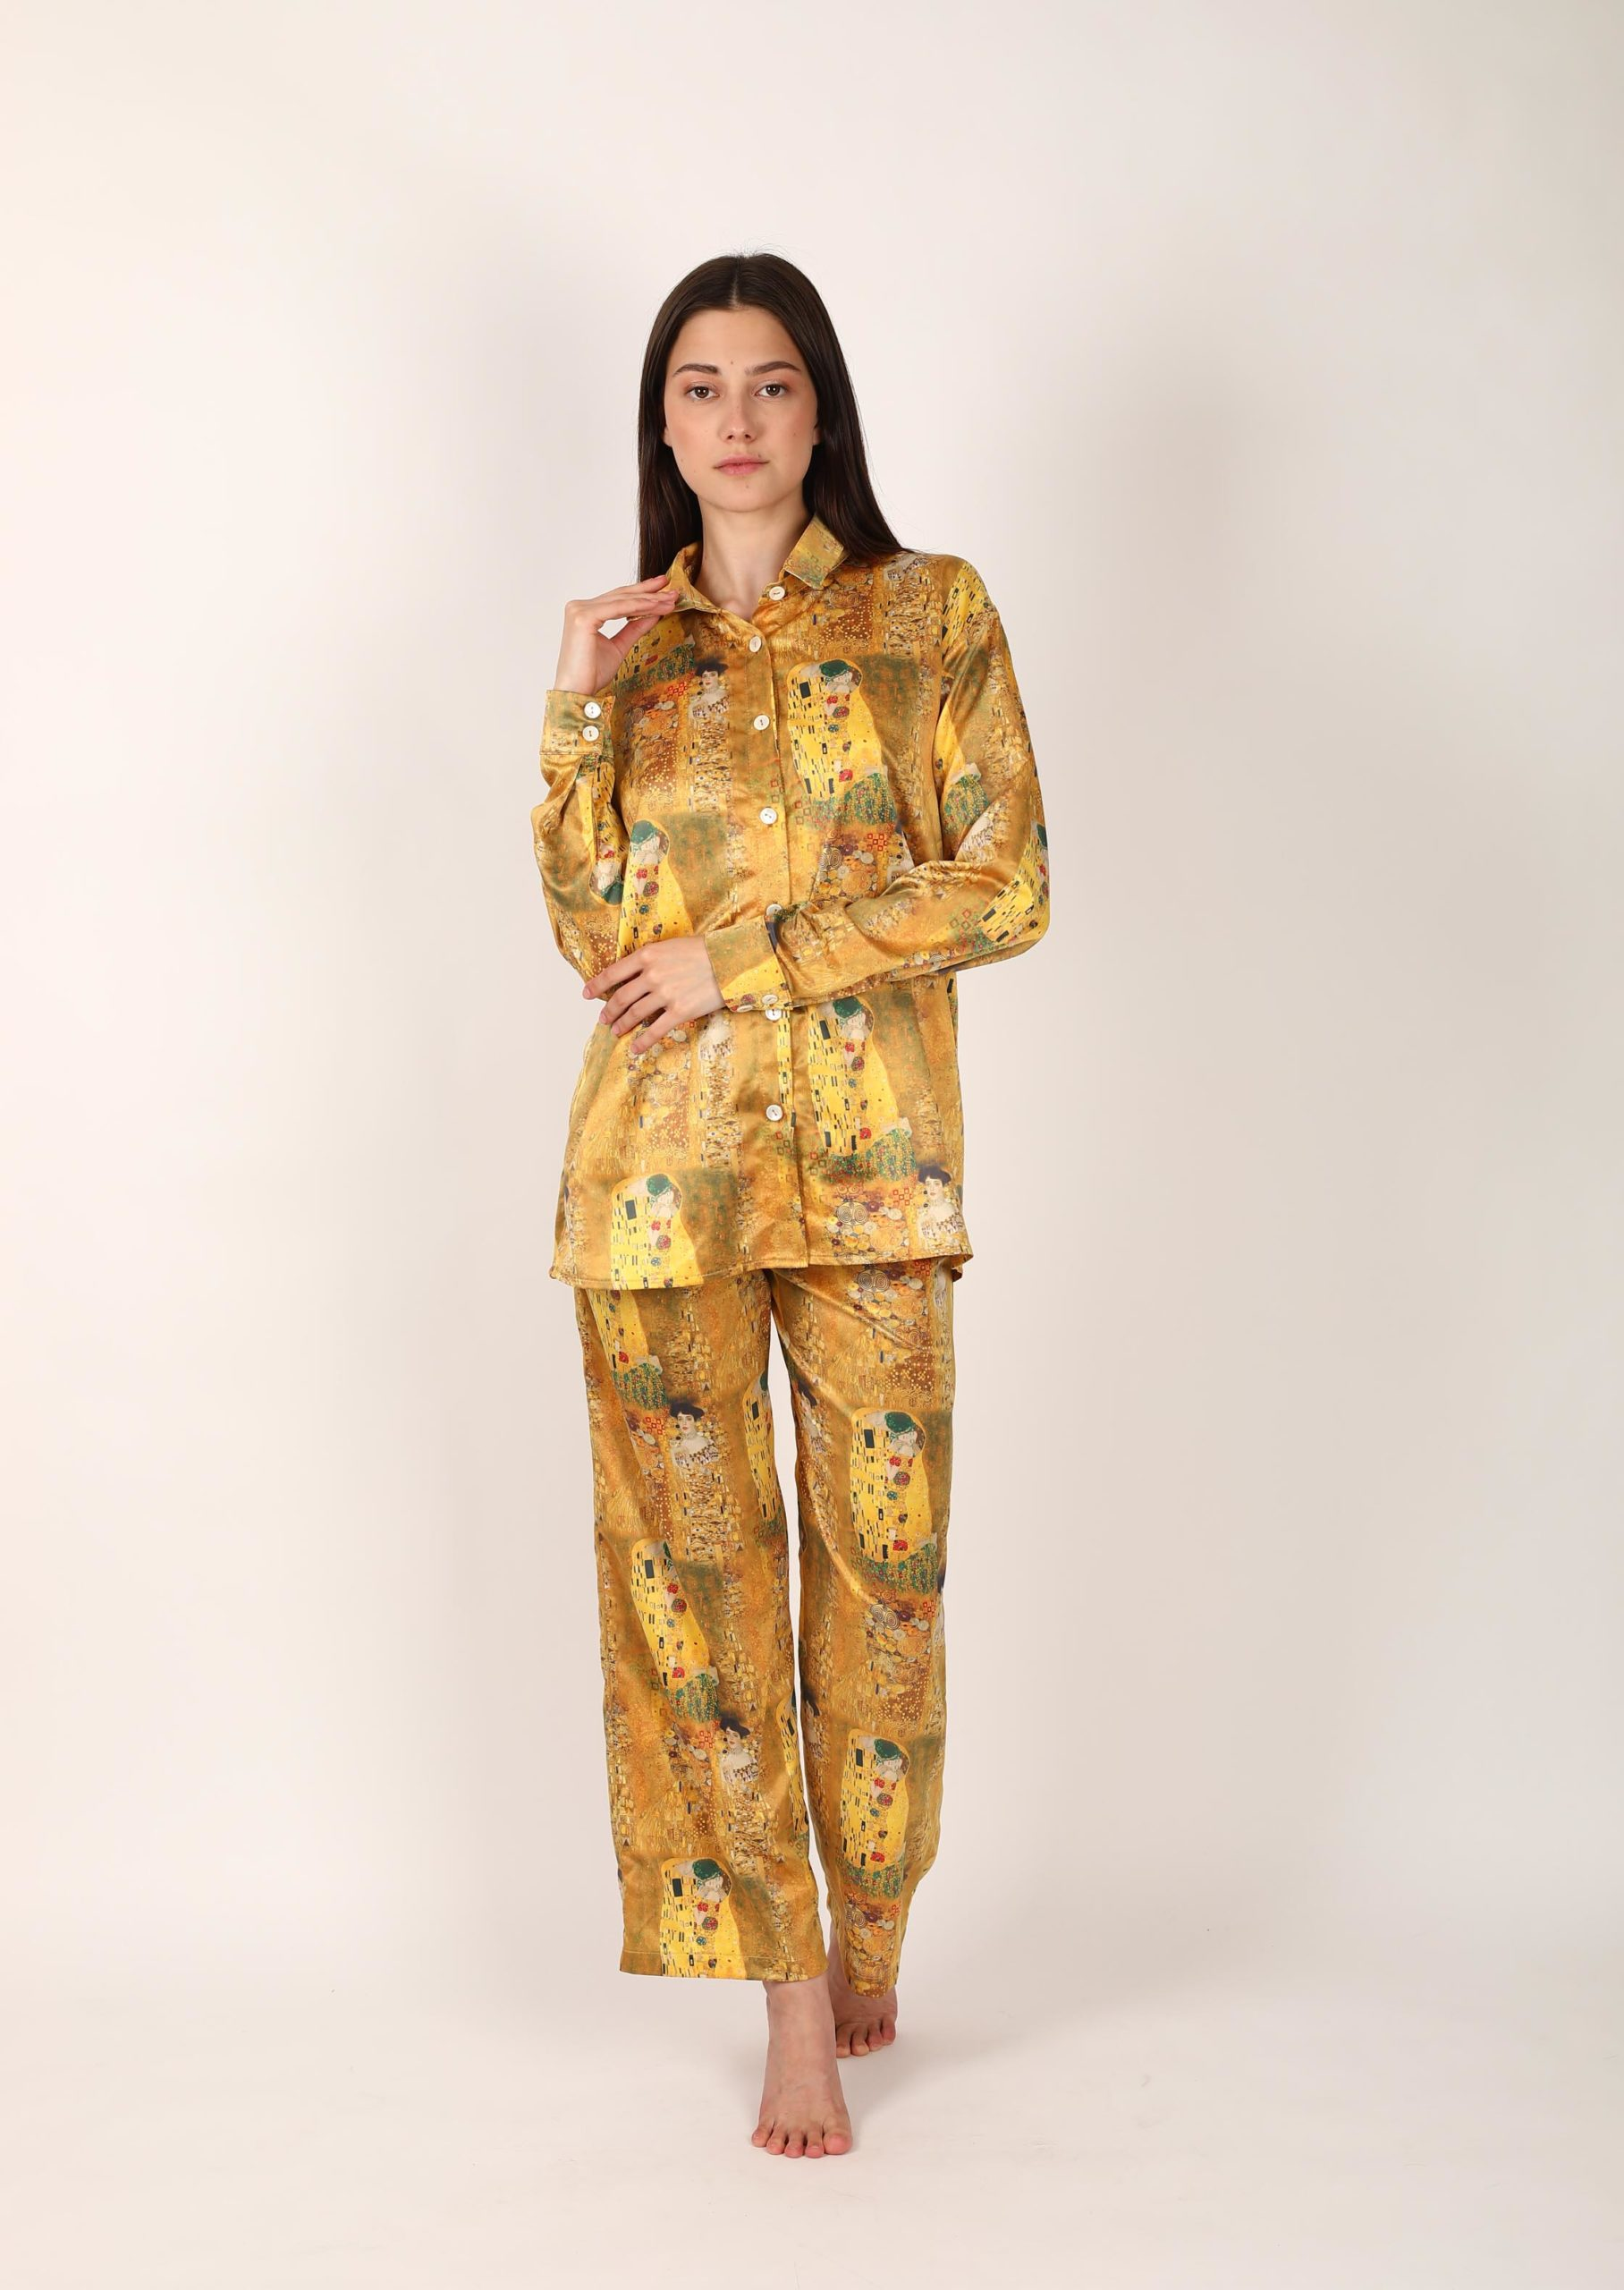 Silk kiss loungewear set / organic pajama set with print of Gustav Klimt / elegant satin pattern sleepwear for women with shirt and pants